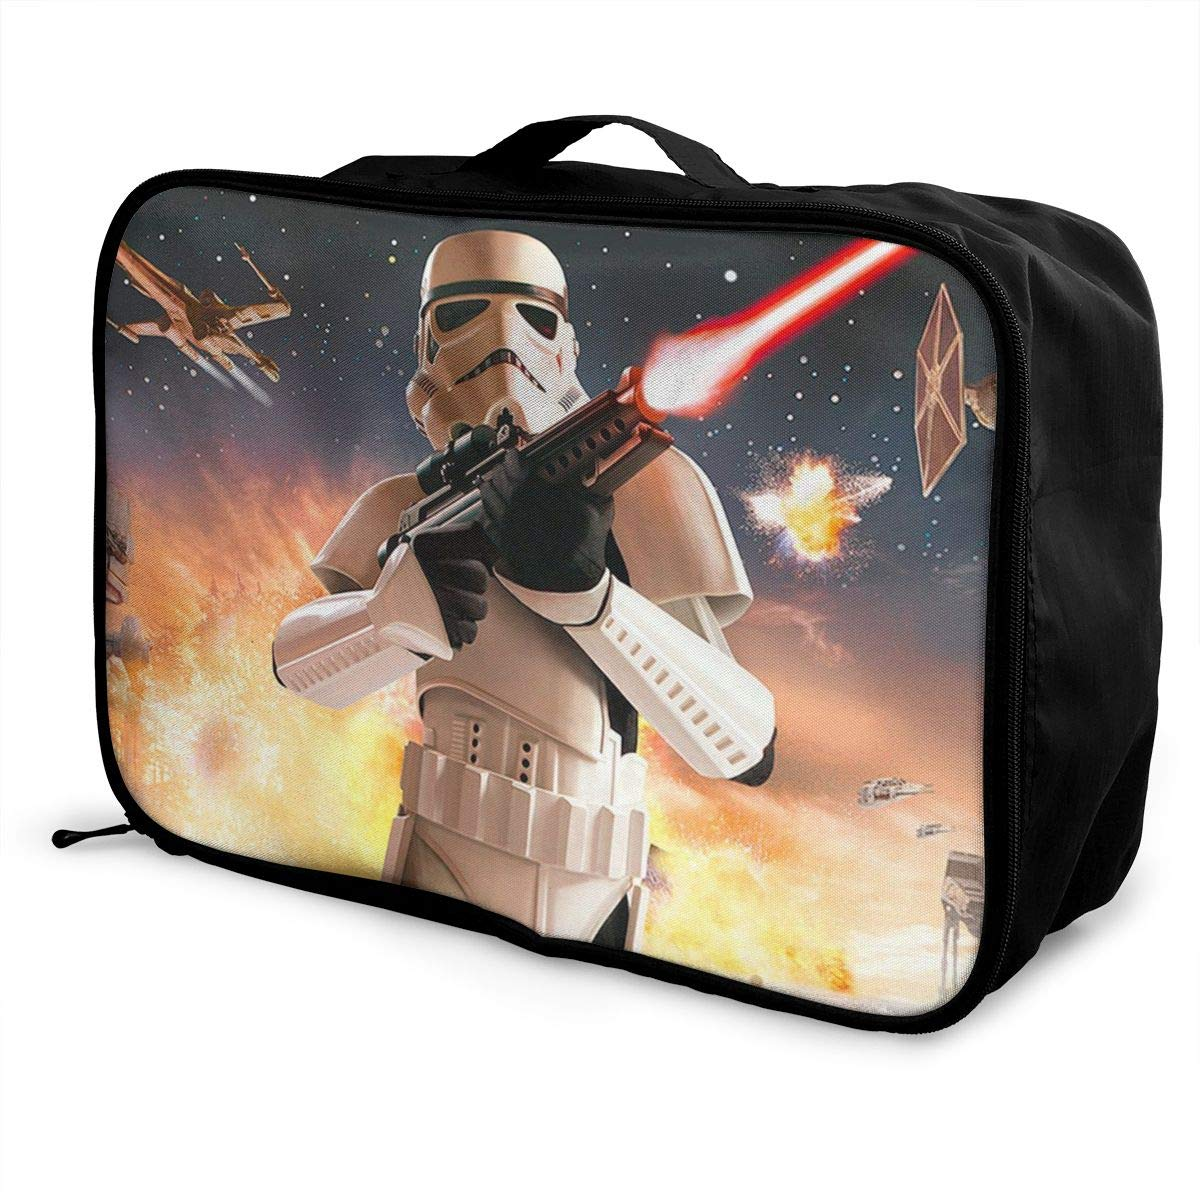 BOKAIKAI1306 Cool S-Star Wars Unisex Adult Fashion Lightweight Large Capacity Portable Large Travel Duffel Bag Mens Women Luggage Bag 3D Pattern DIY Boarding Box